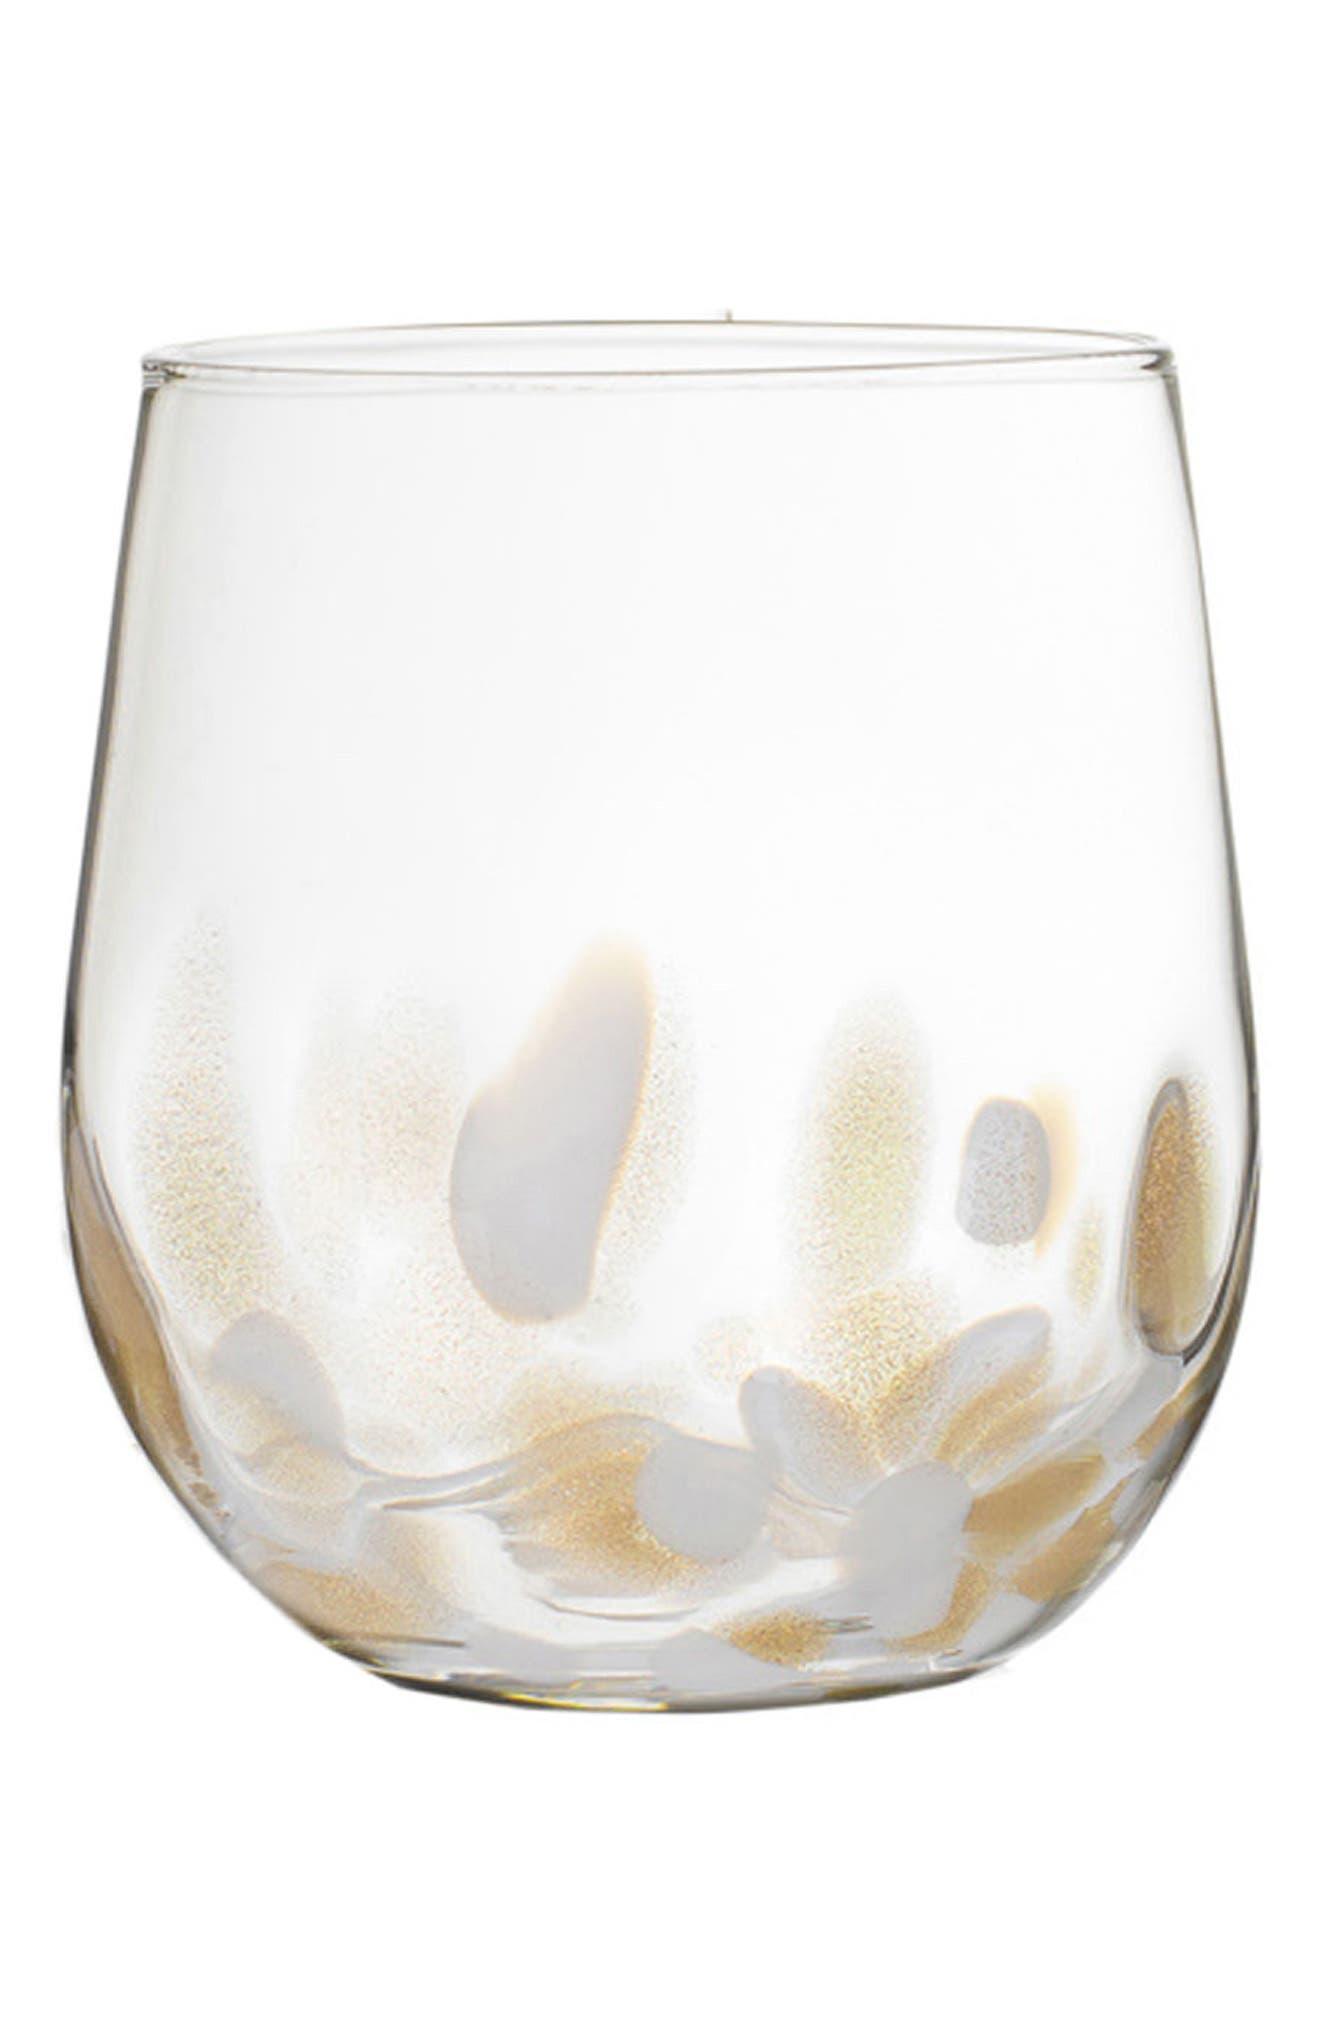 Simone Set of 4 Stemless Wine Glasses,                         Main,                         color, White/ Gold